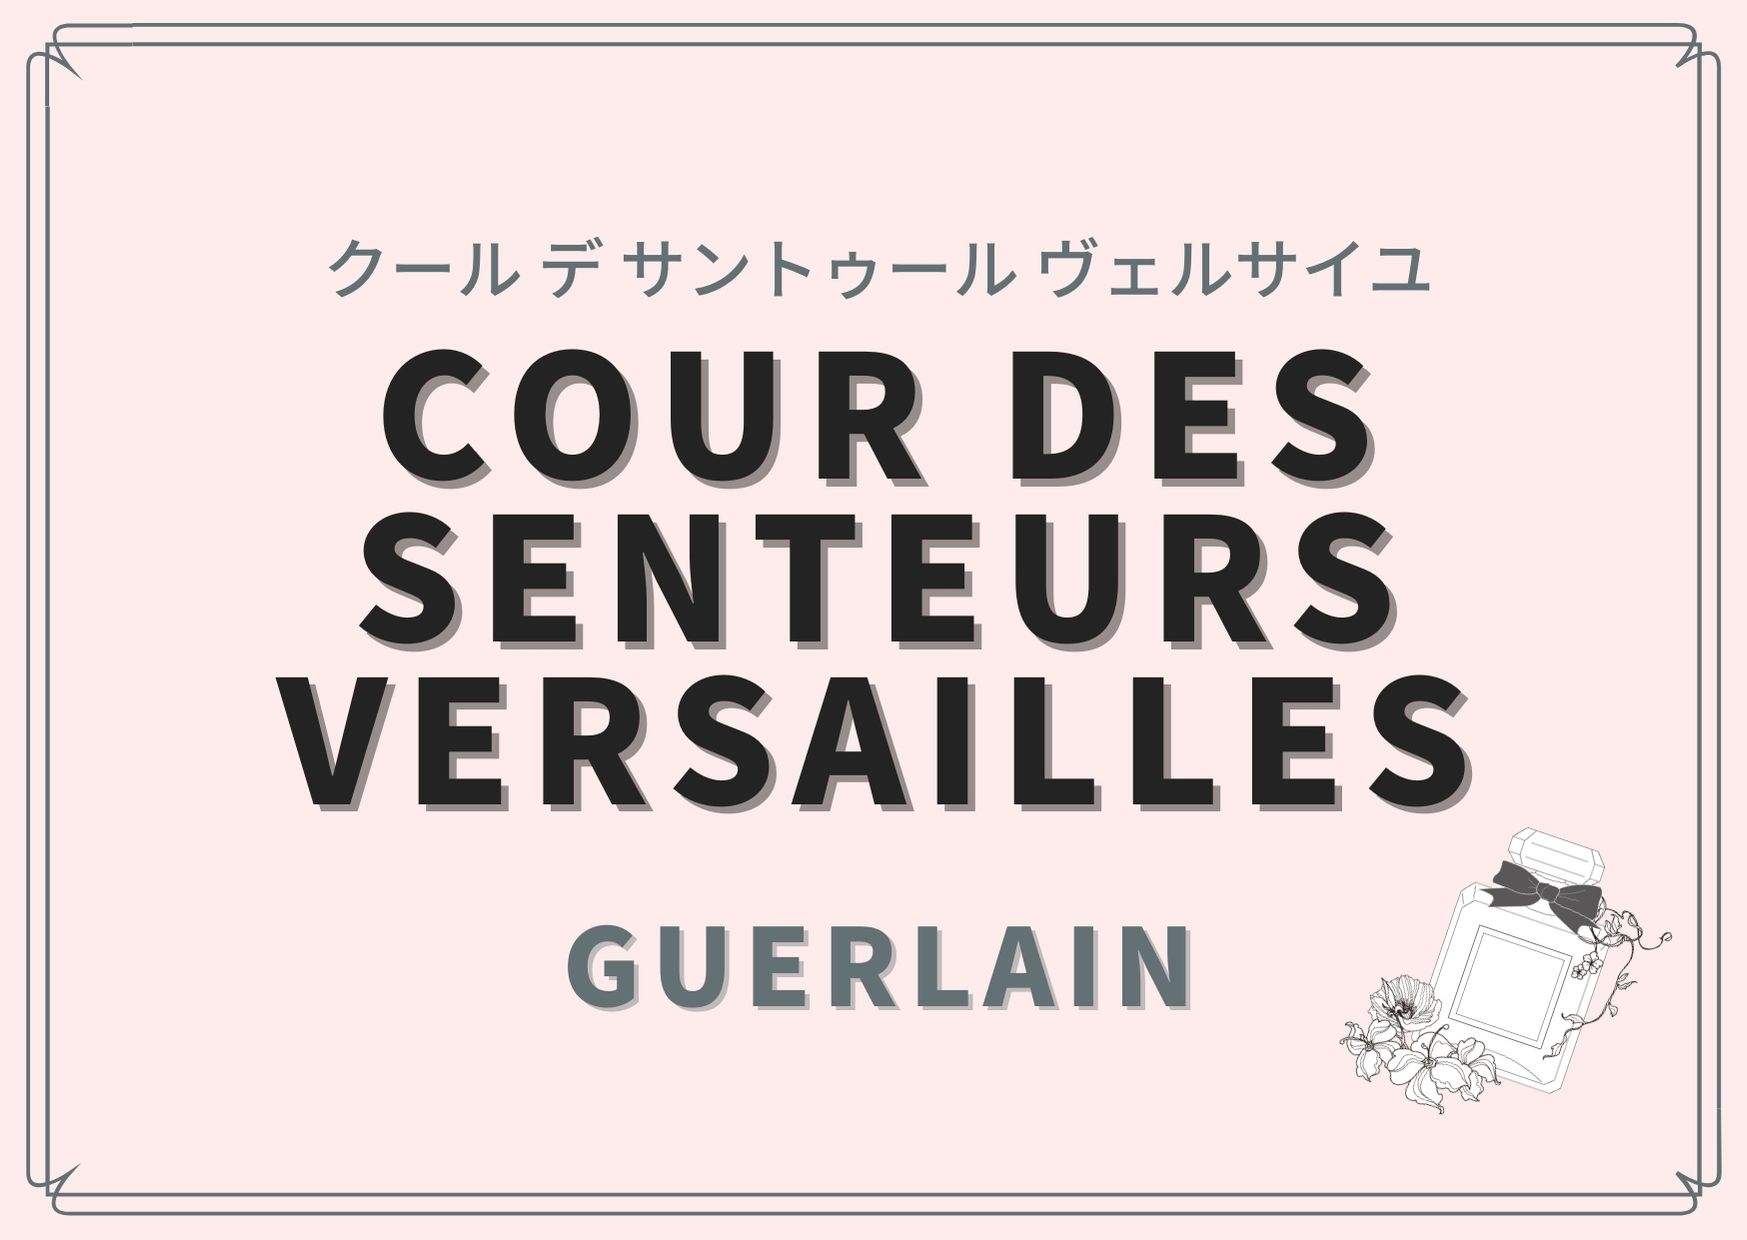 Cour des Senteurs Versailles(クール デ サントゥール ヴェルサイユ)/GUERLAIN(ゲラン)